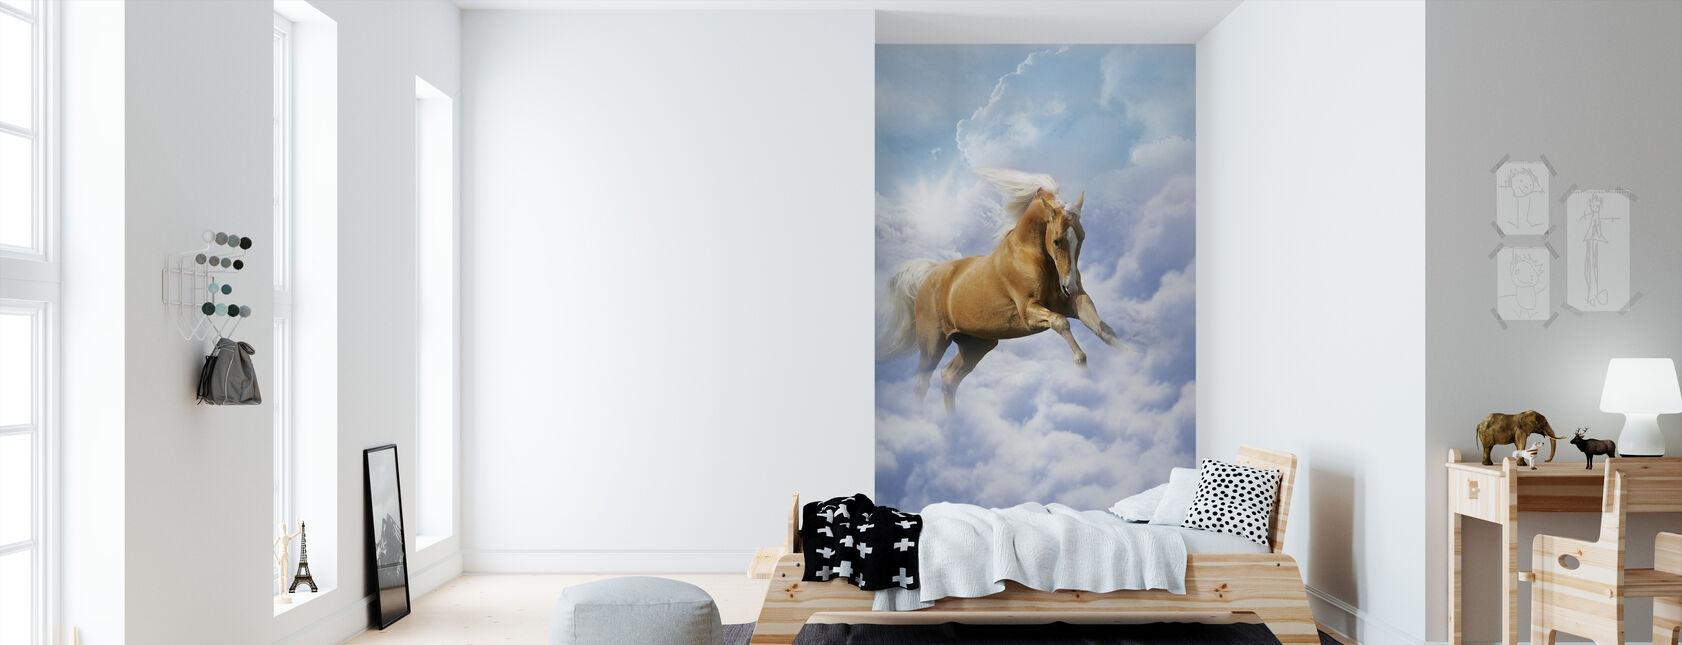 Cloud Horse - Wallpaper - Kids Room